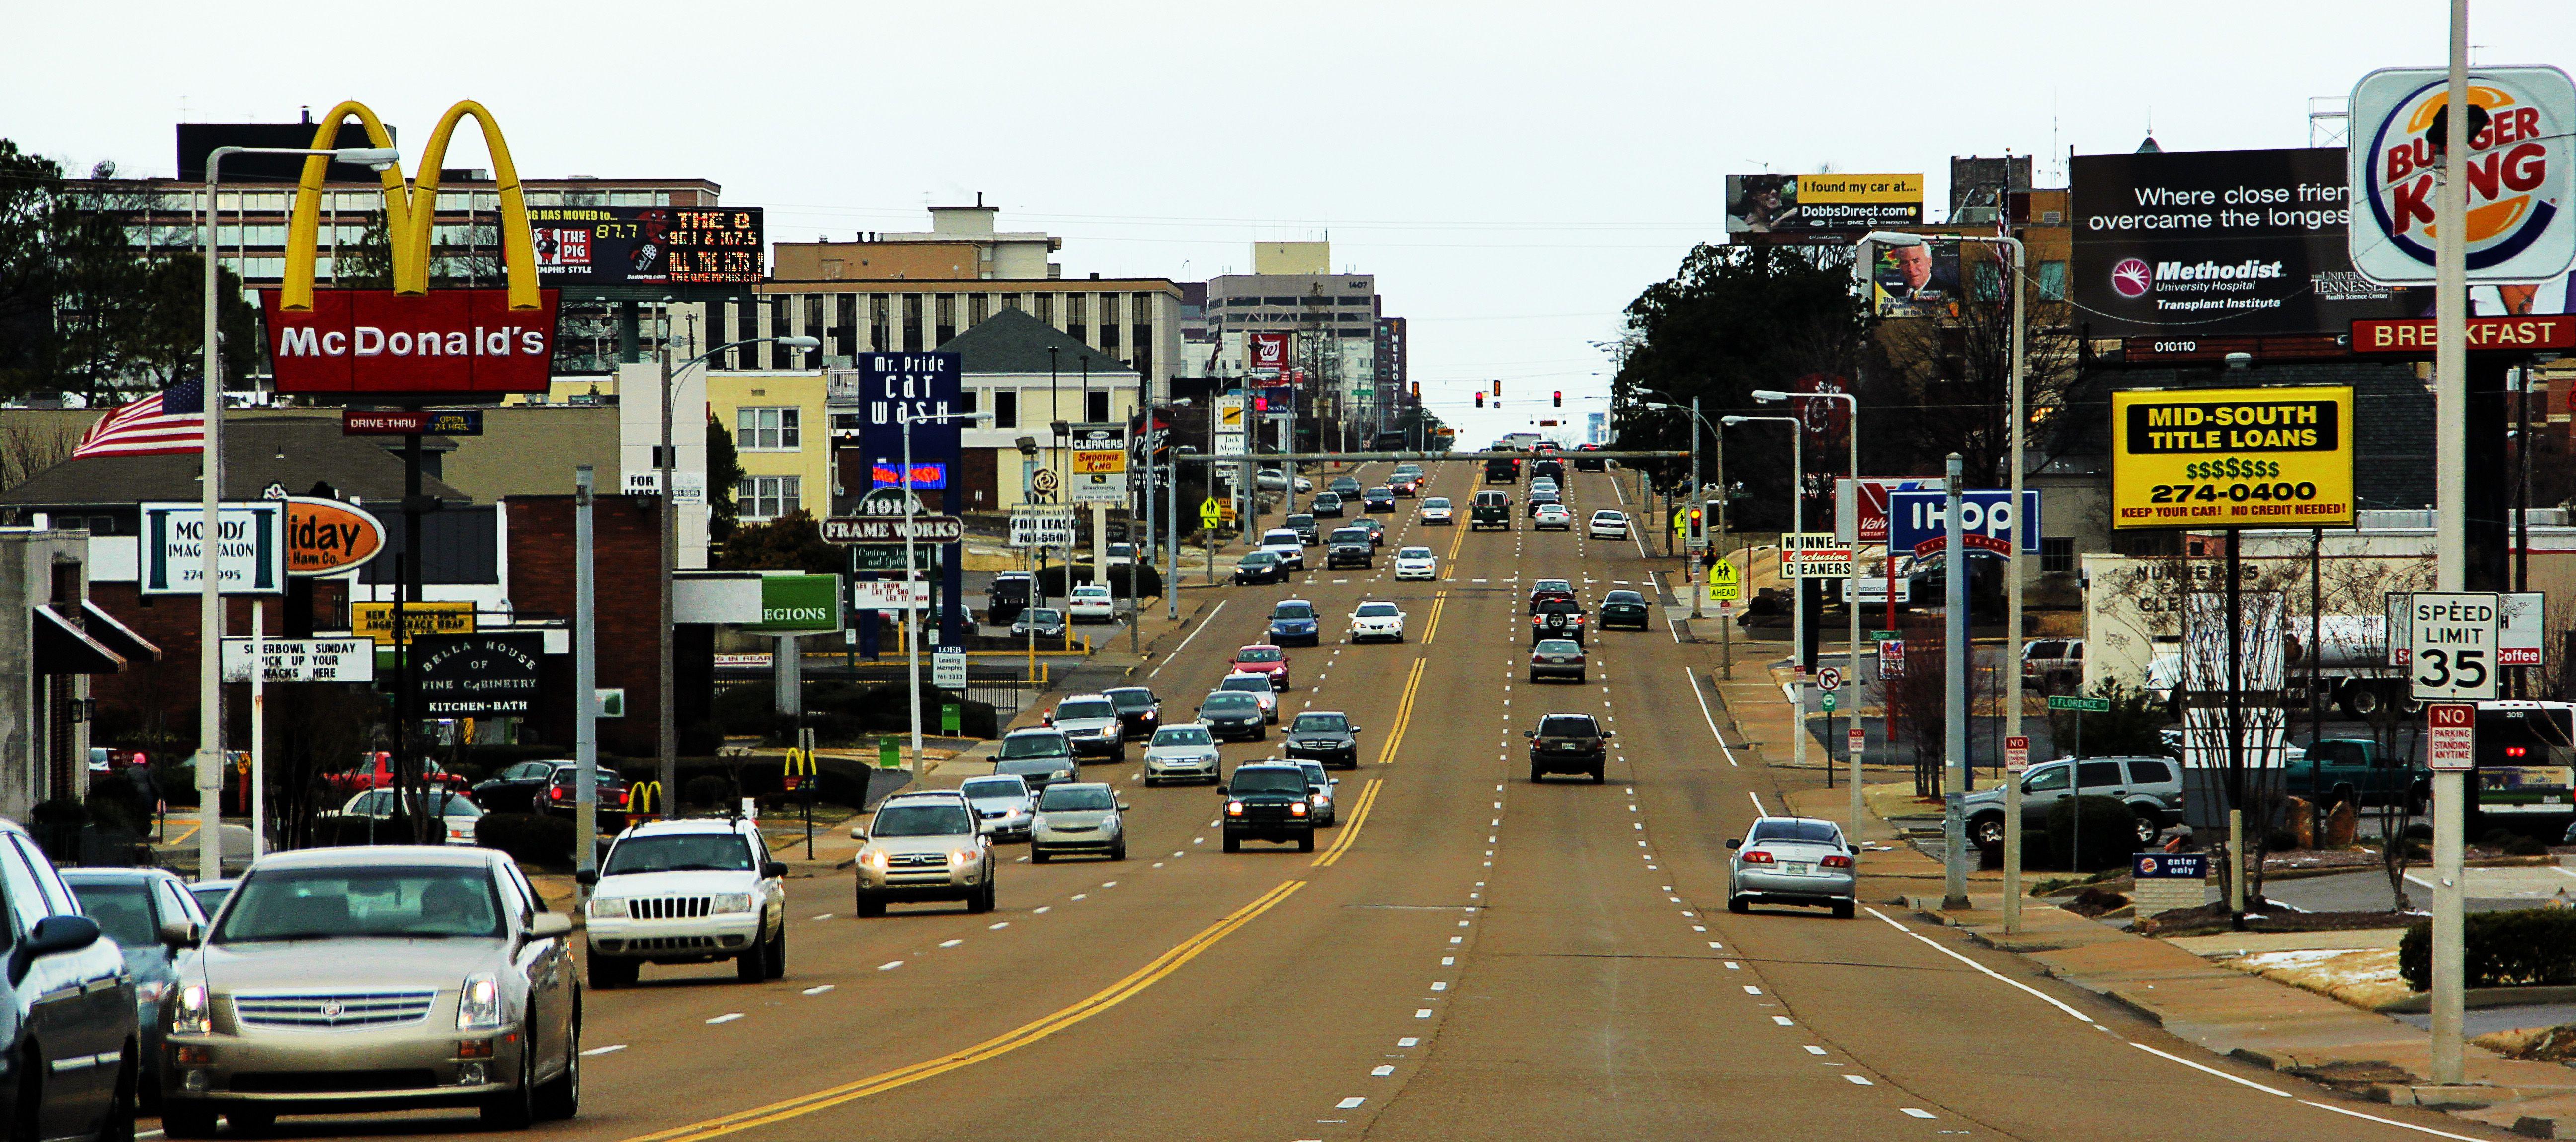 Union Ave running right through midtown Memphis, TN